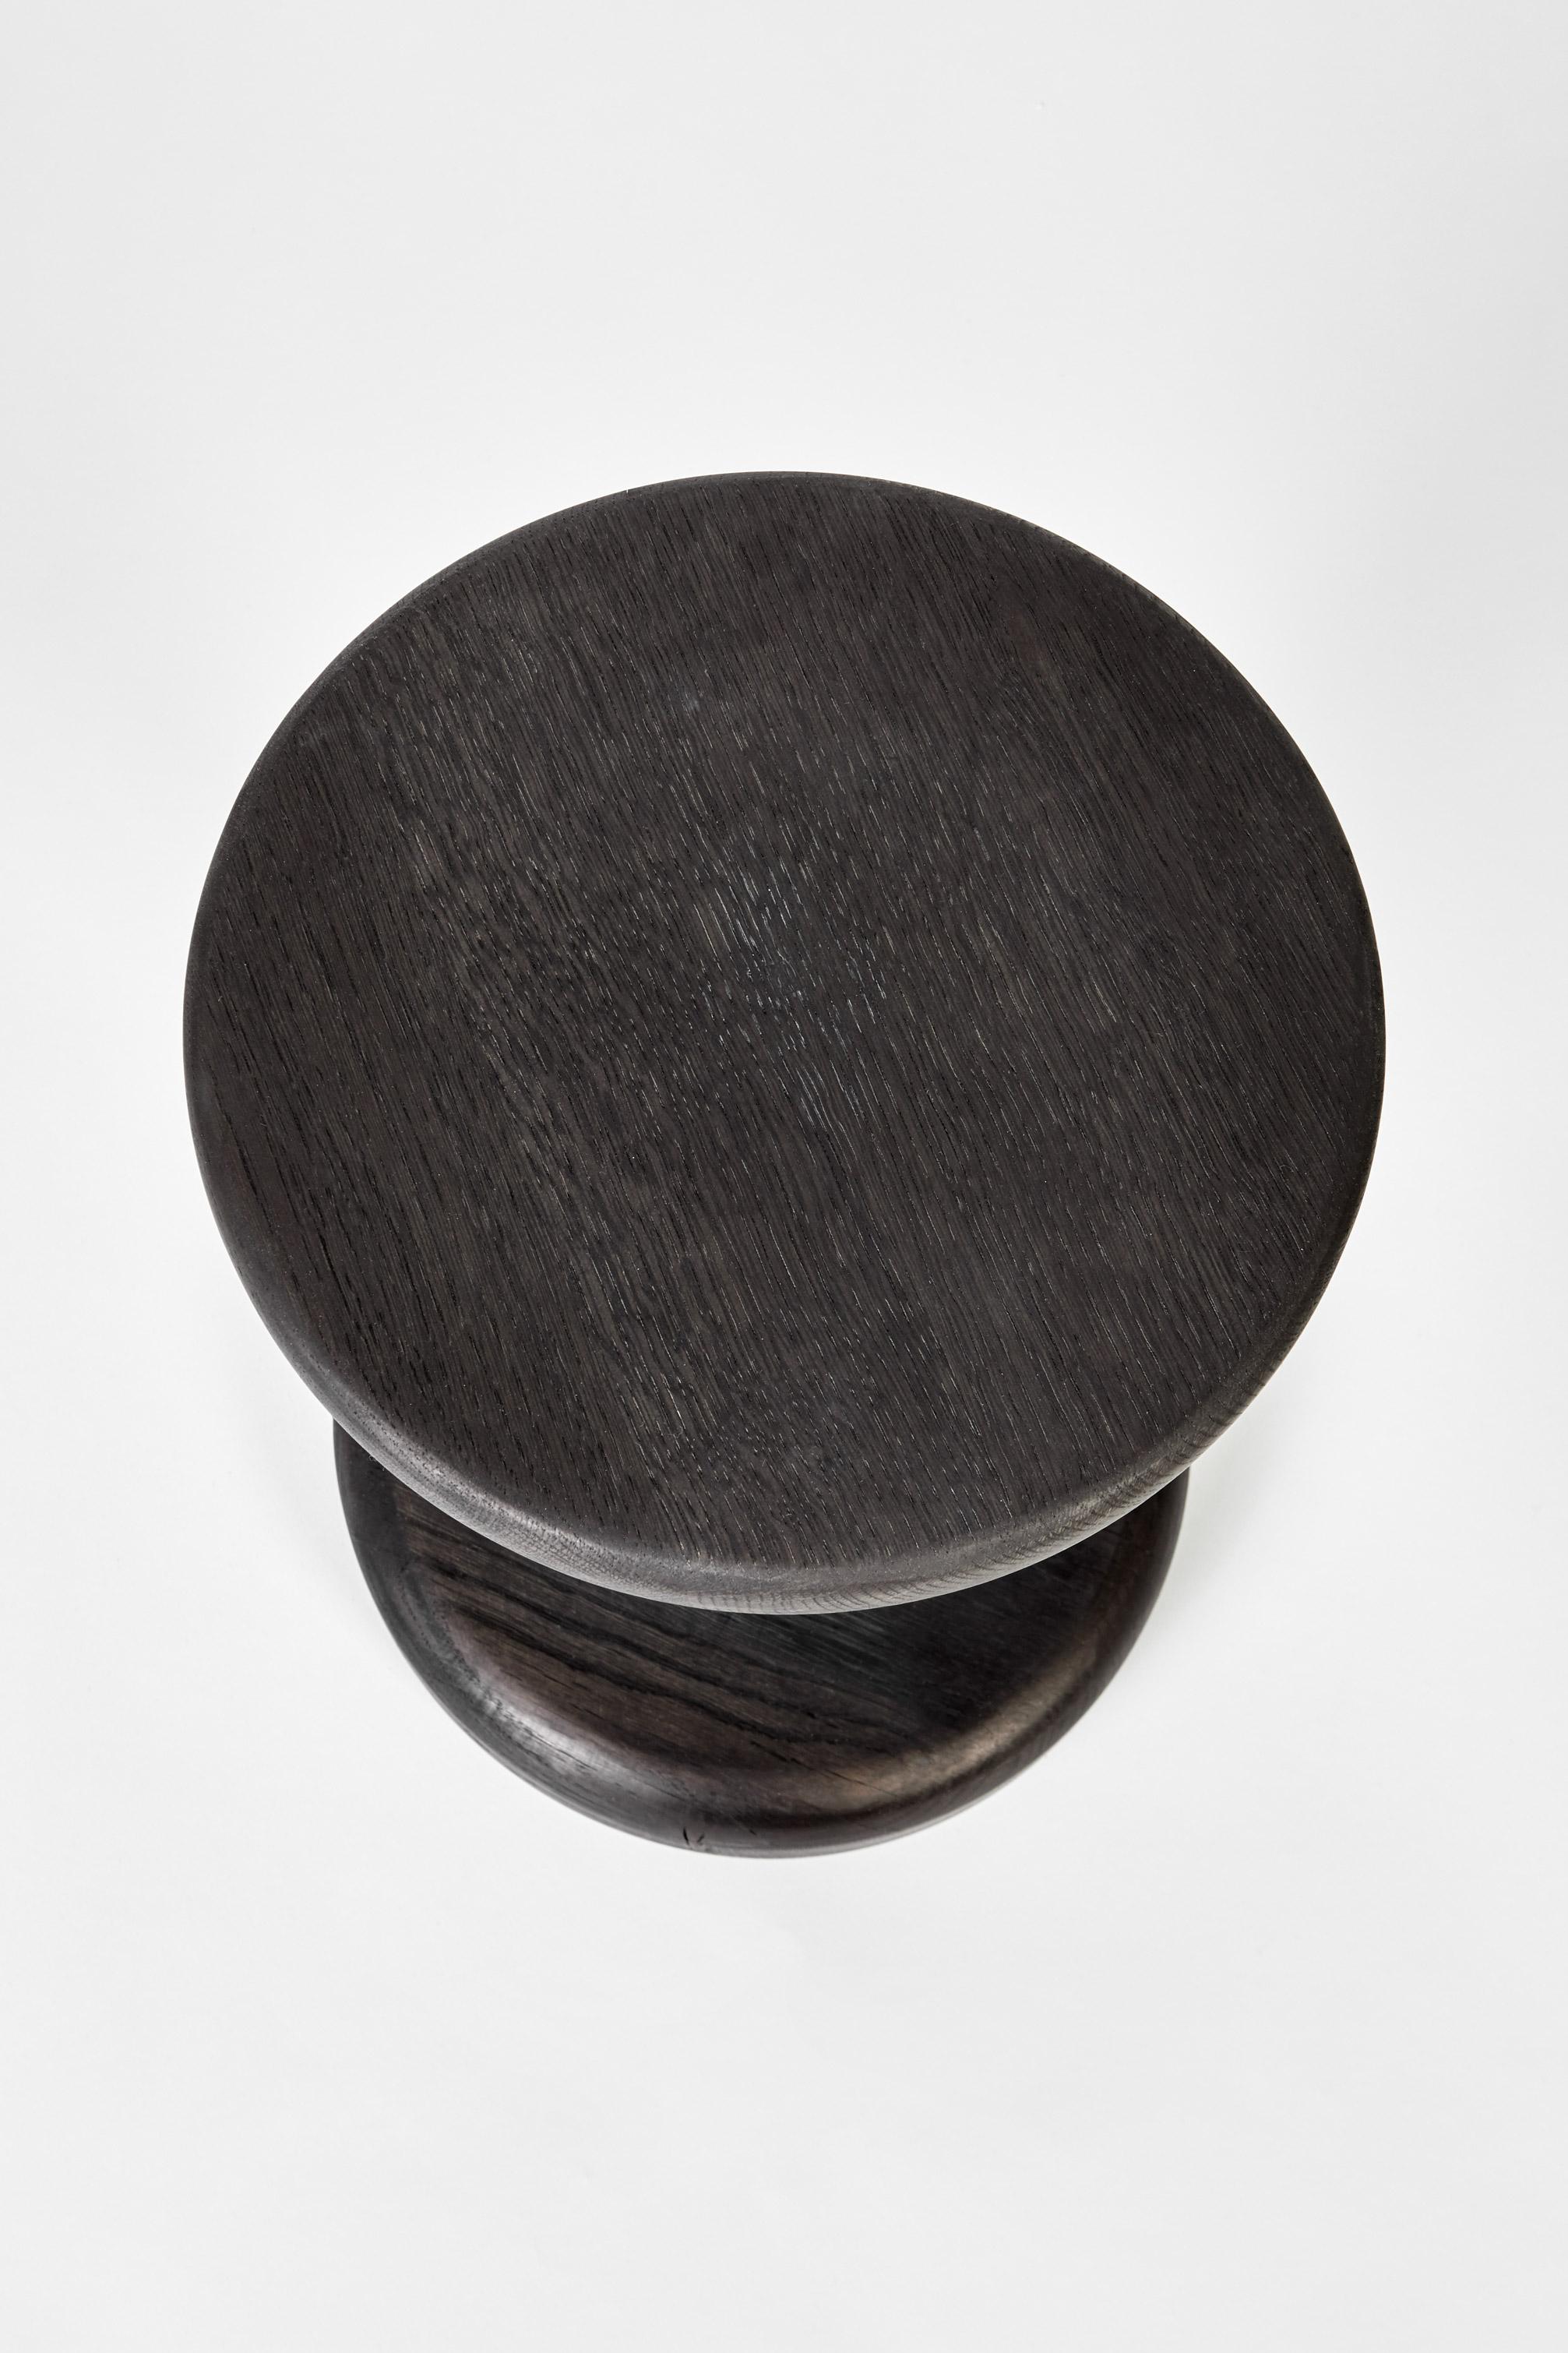 Medium-Pedestal_Black_04.jpg